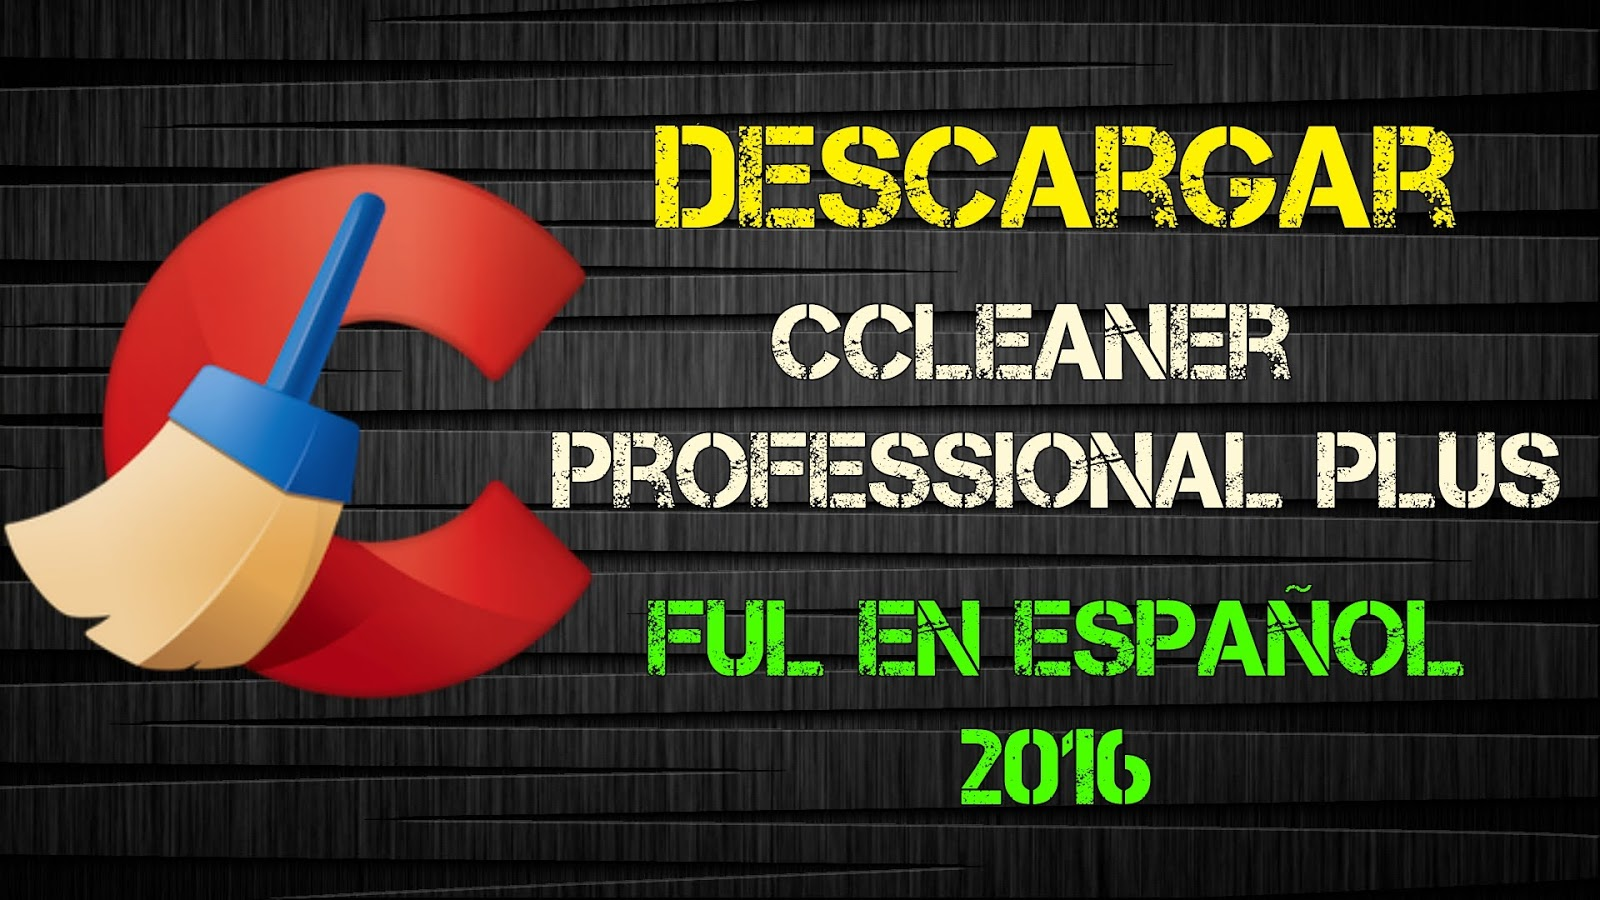 descargar ccleaner professional plus full español